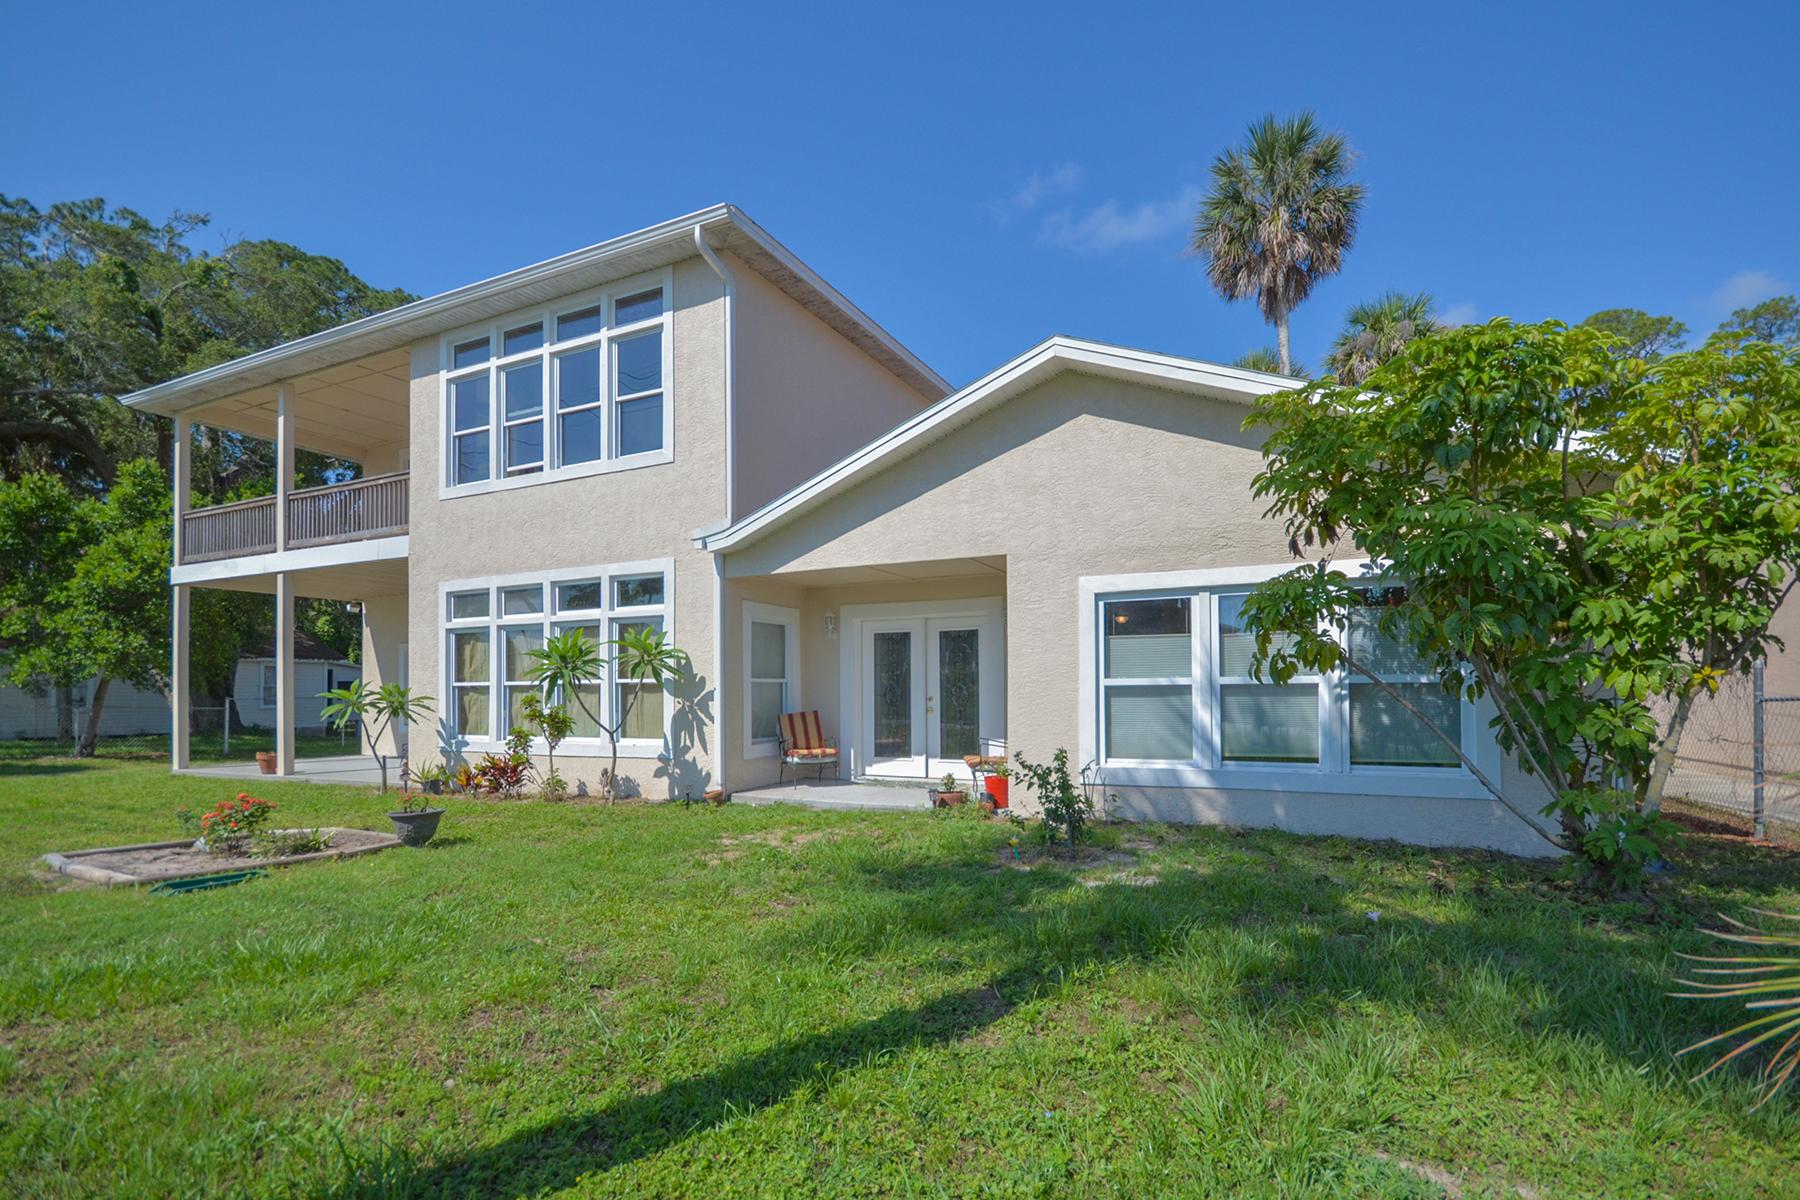 Moradia para Venda às DAYTONA BEACH - HOLLY HILL 1618 Riverside Dr Holly Hill, Florida, 32117 Estados Unidos